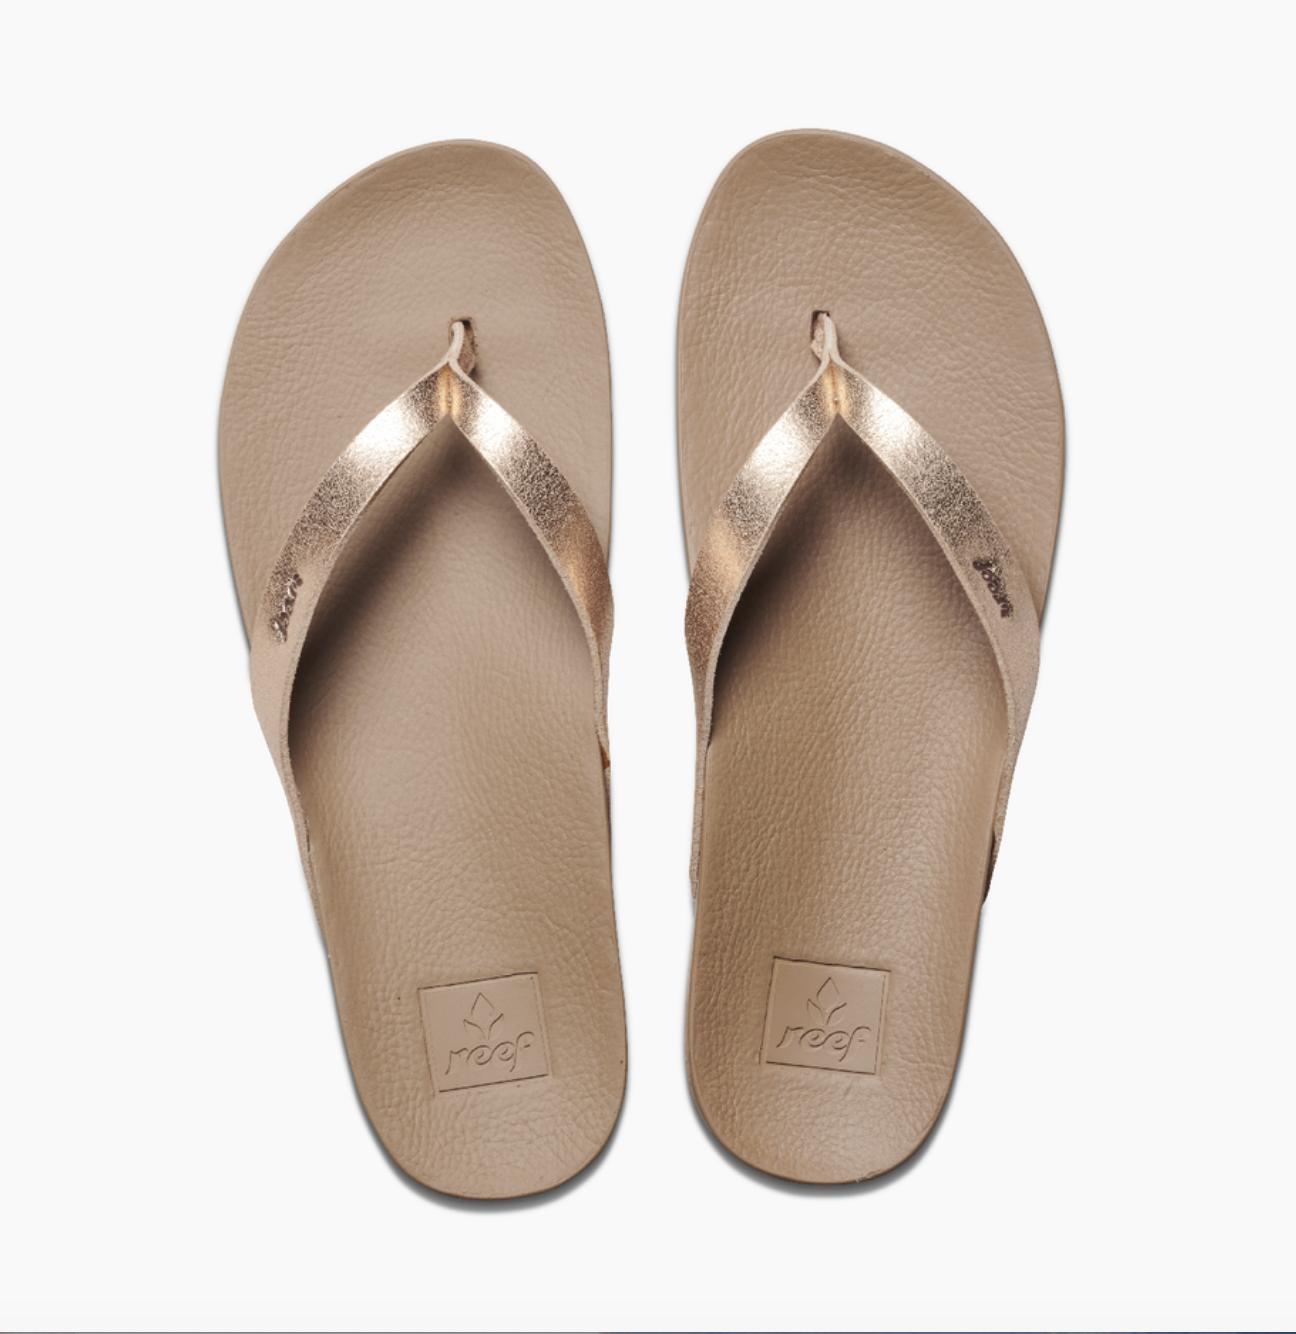 11 Best Flip-Flops for Women 2020